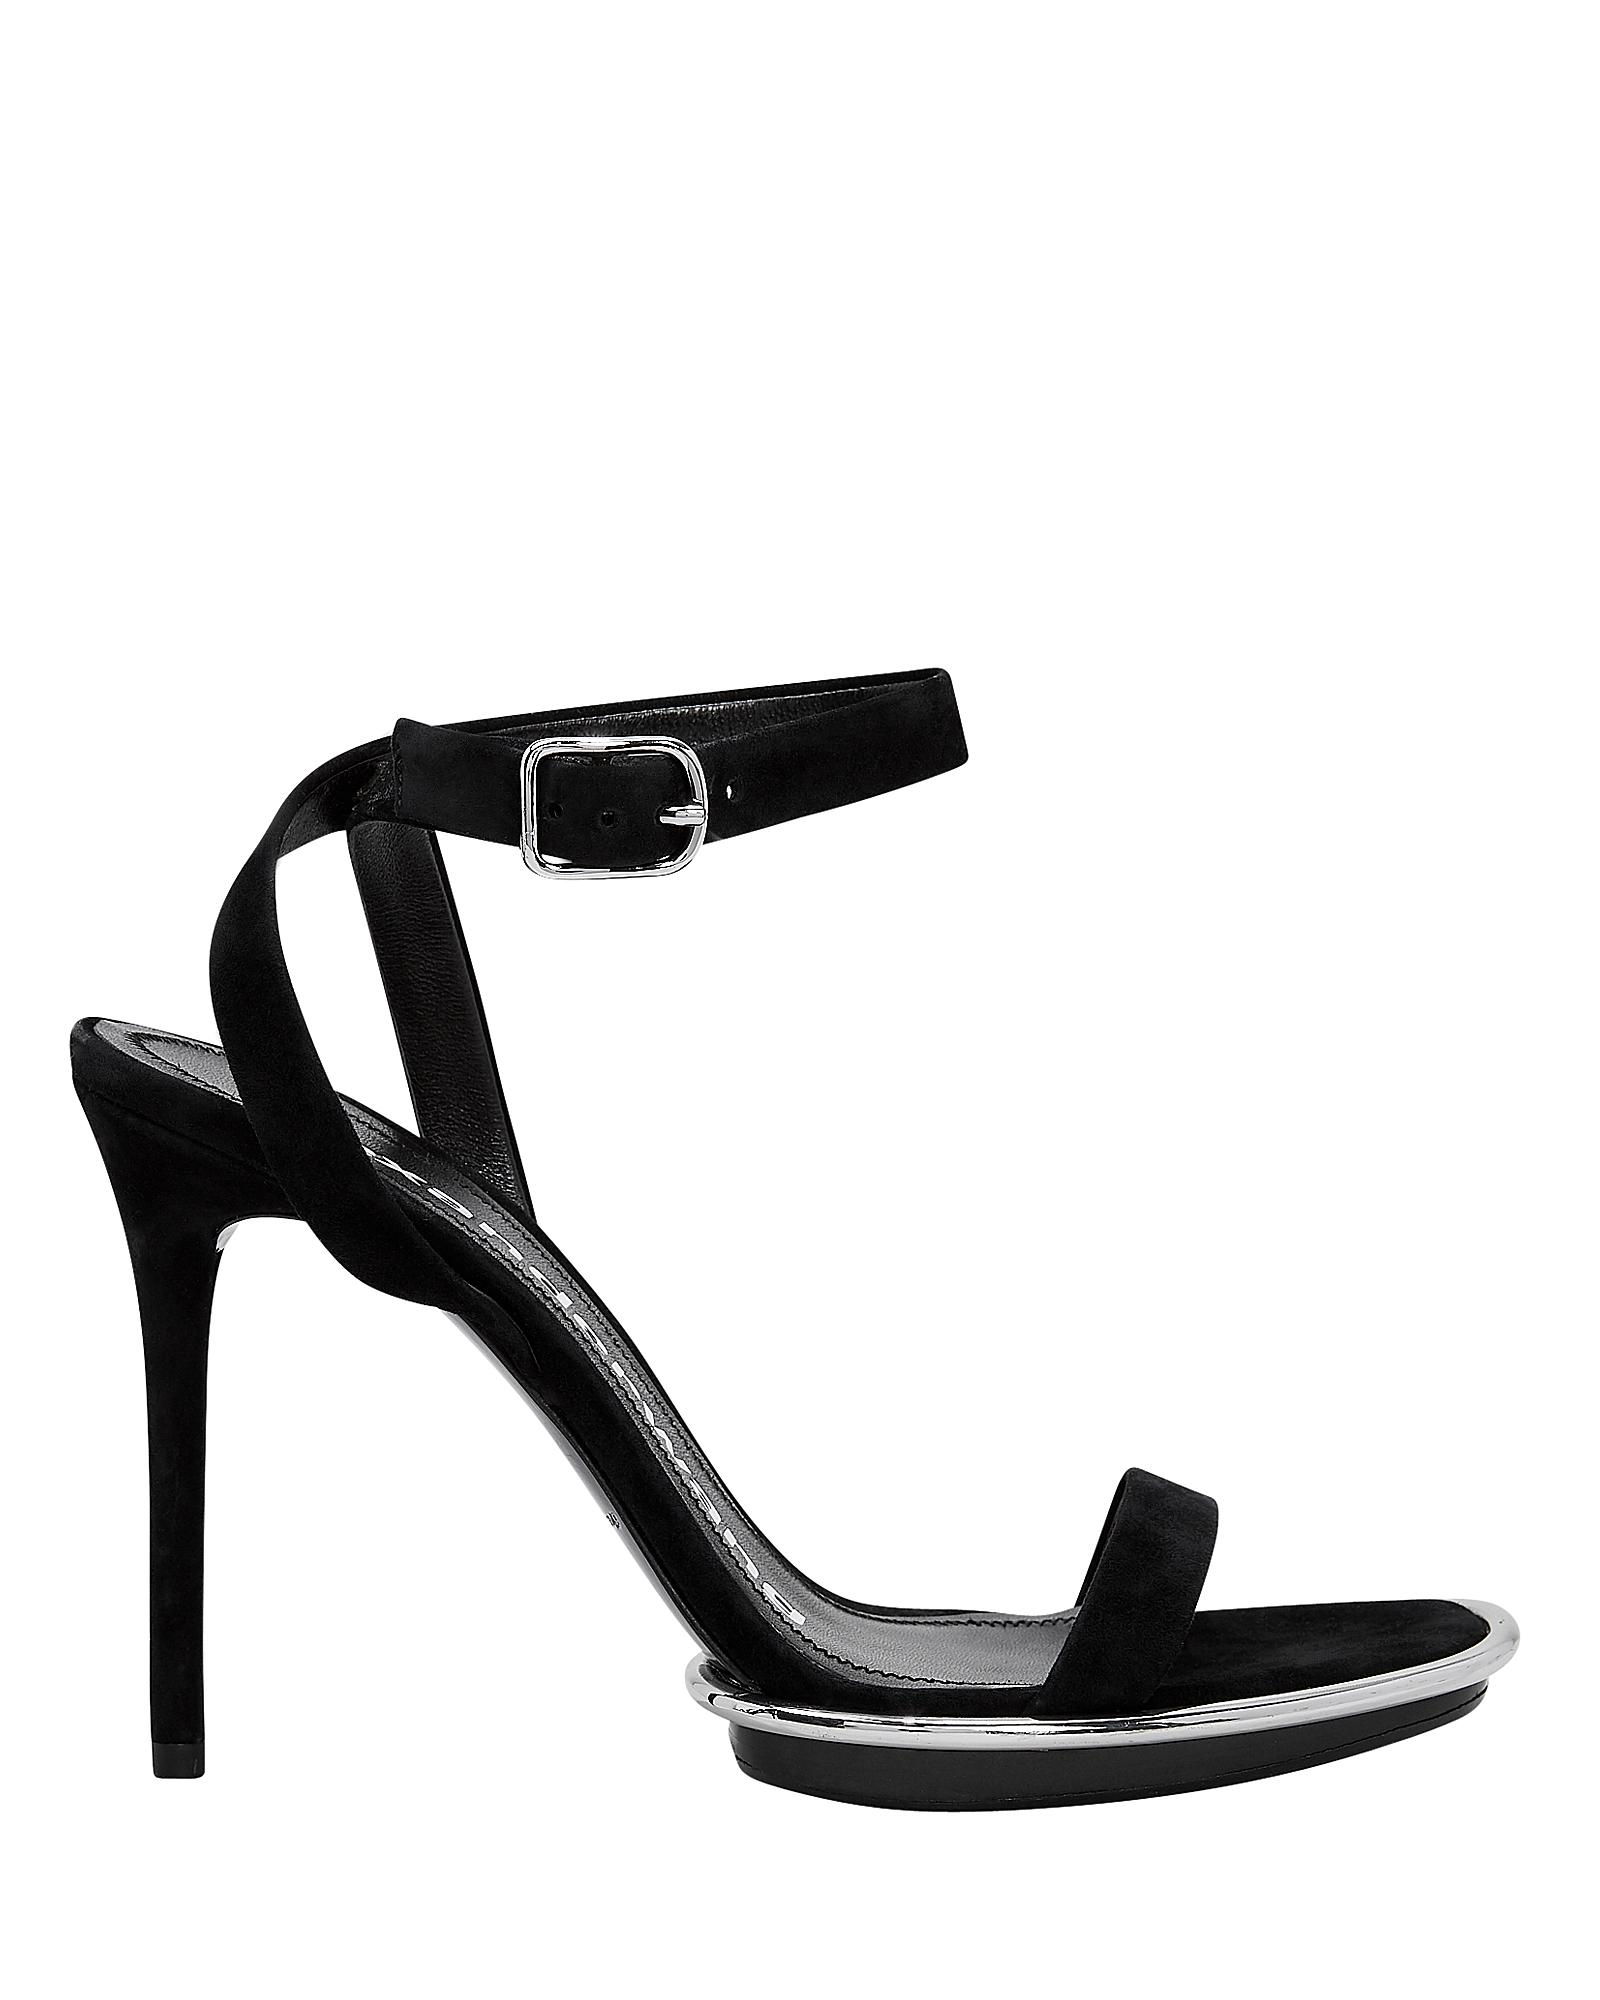 Cady Metallic-Trimmed Suede Platform Sandals in Black